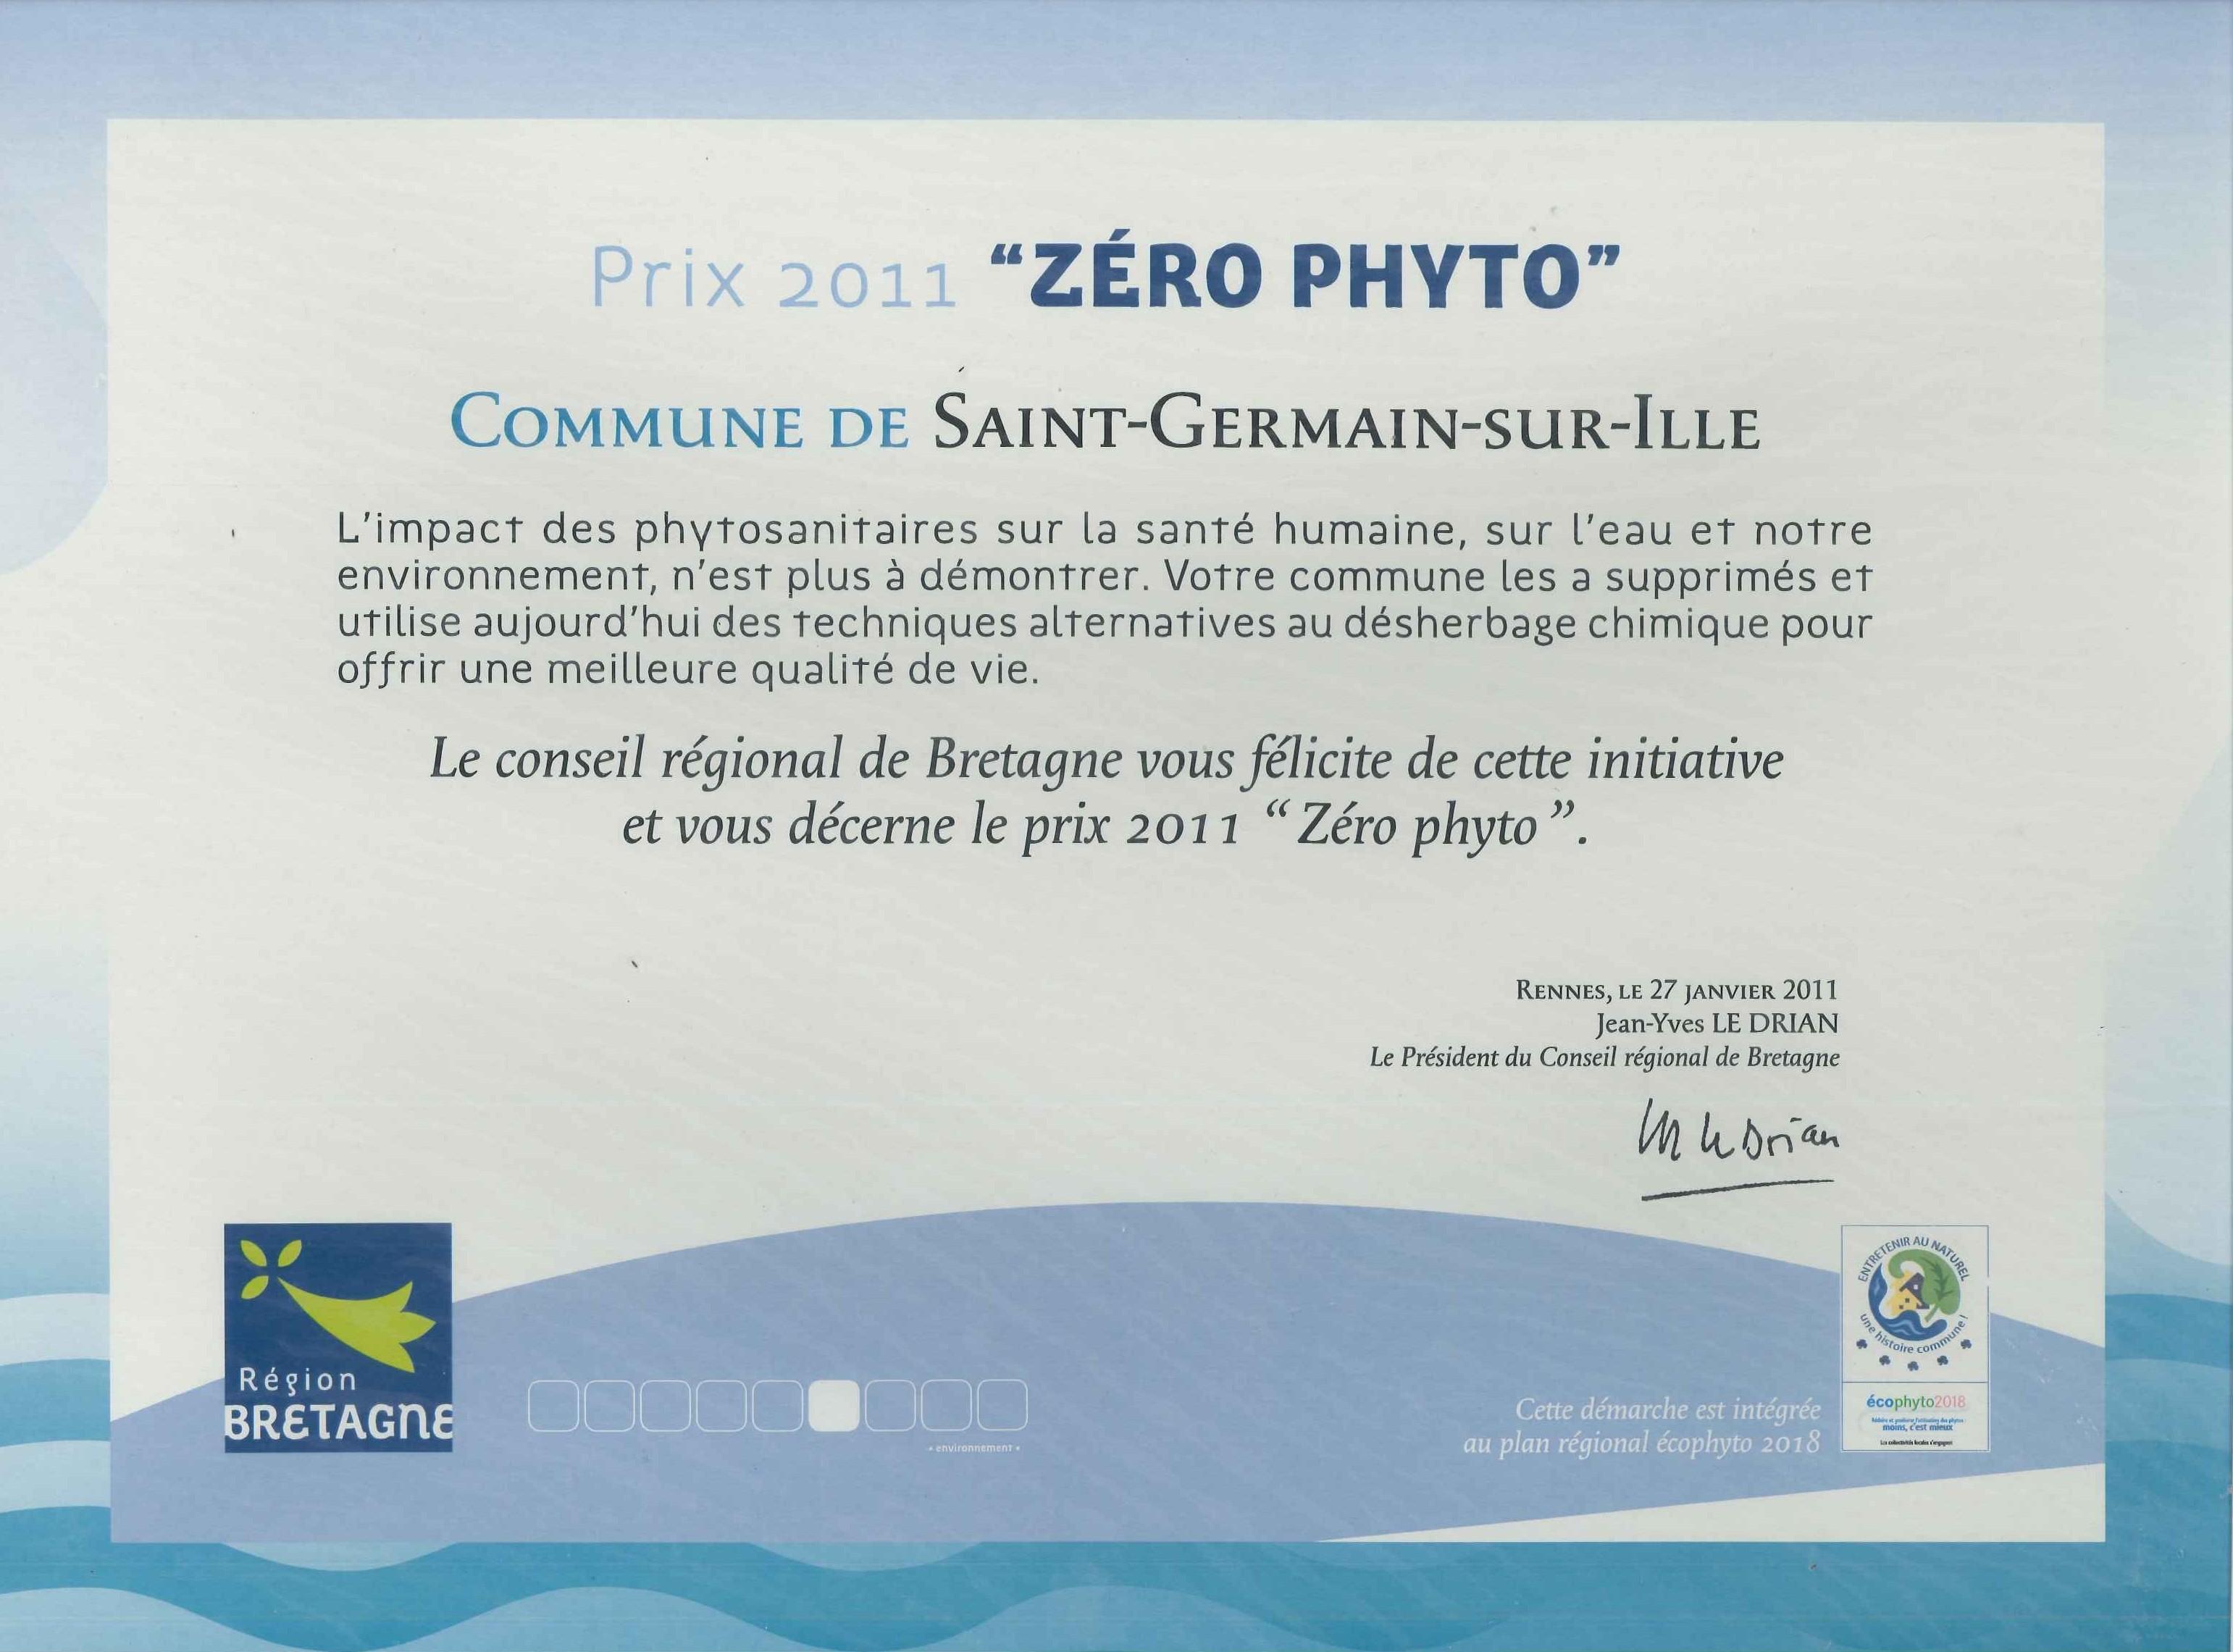 Zéro phyto 2011